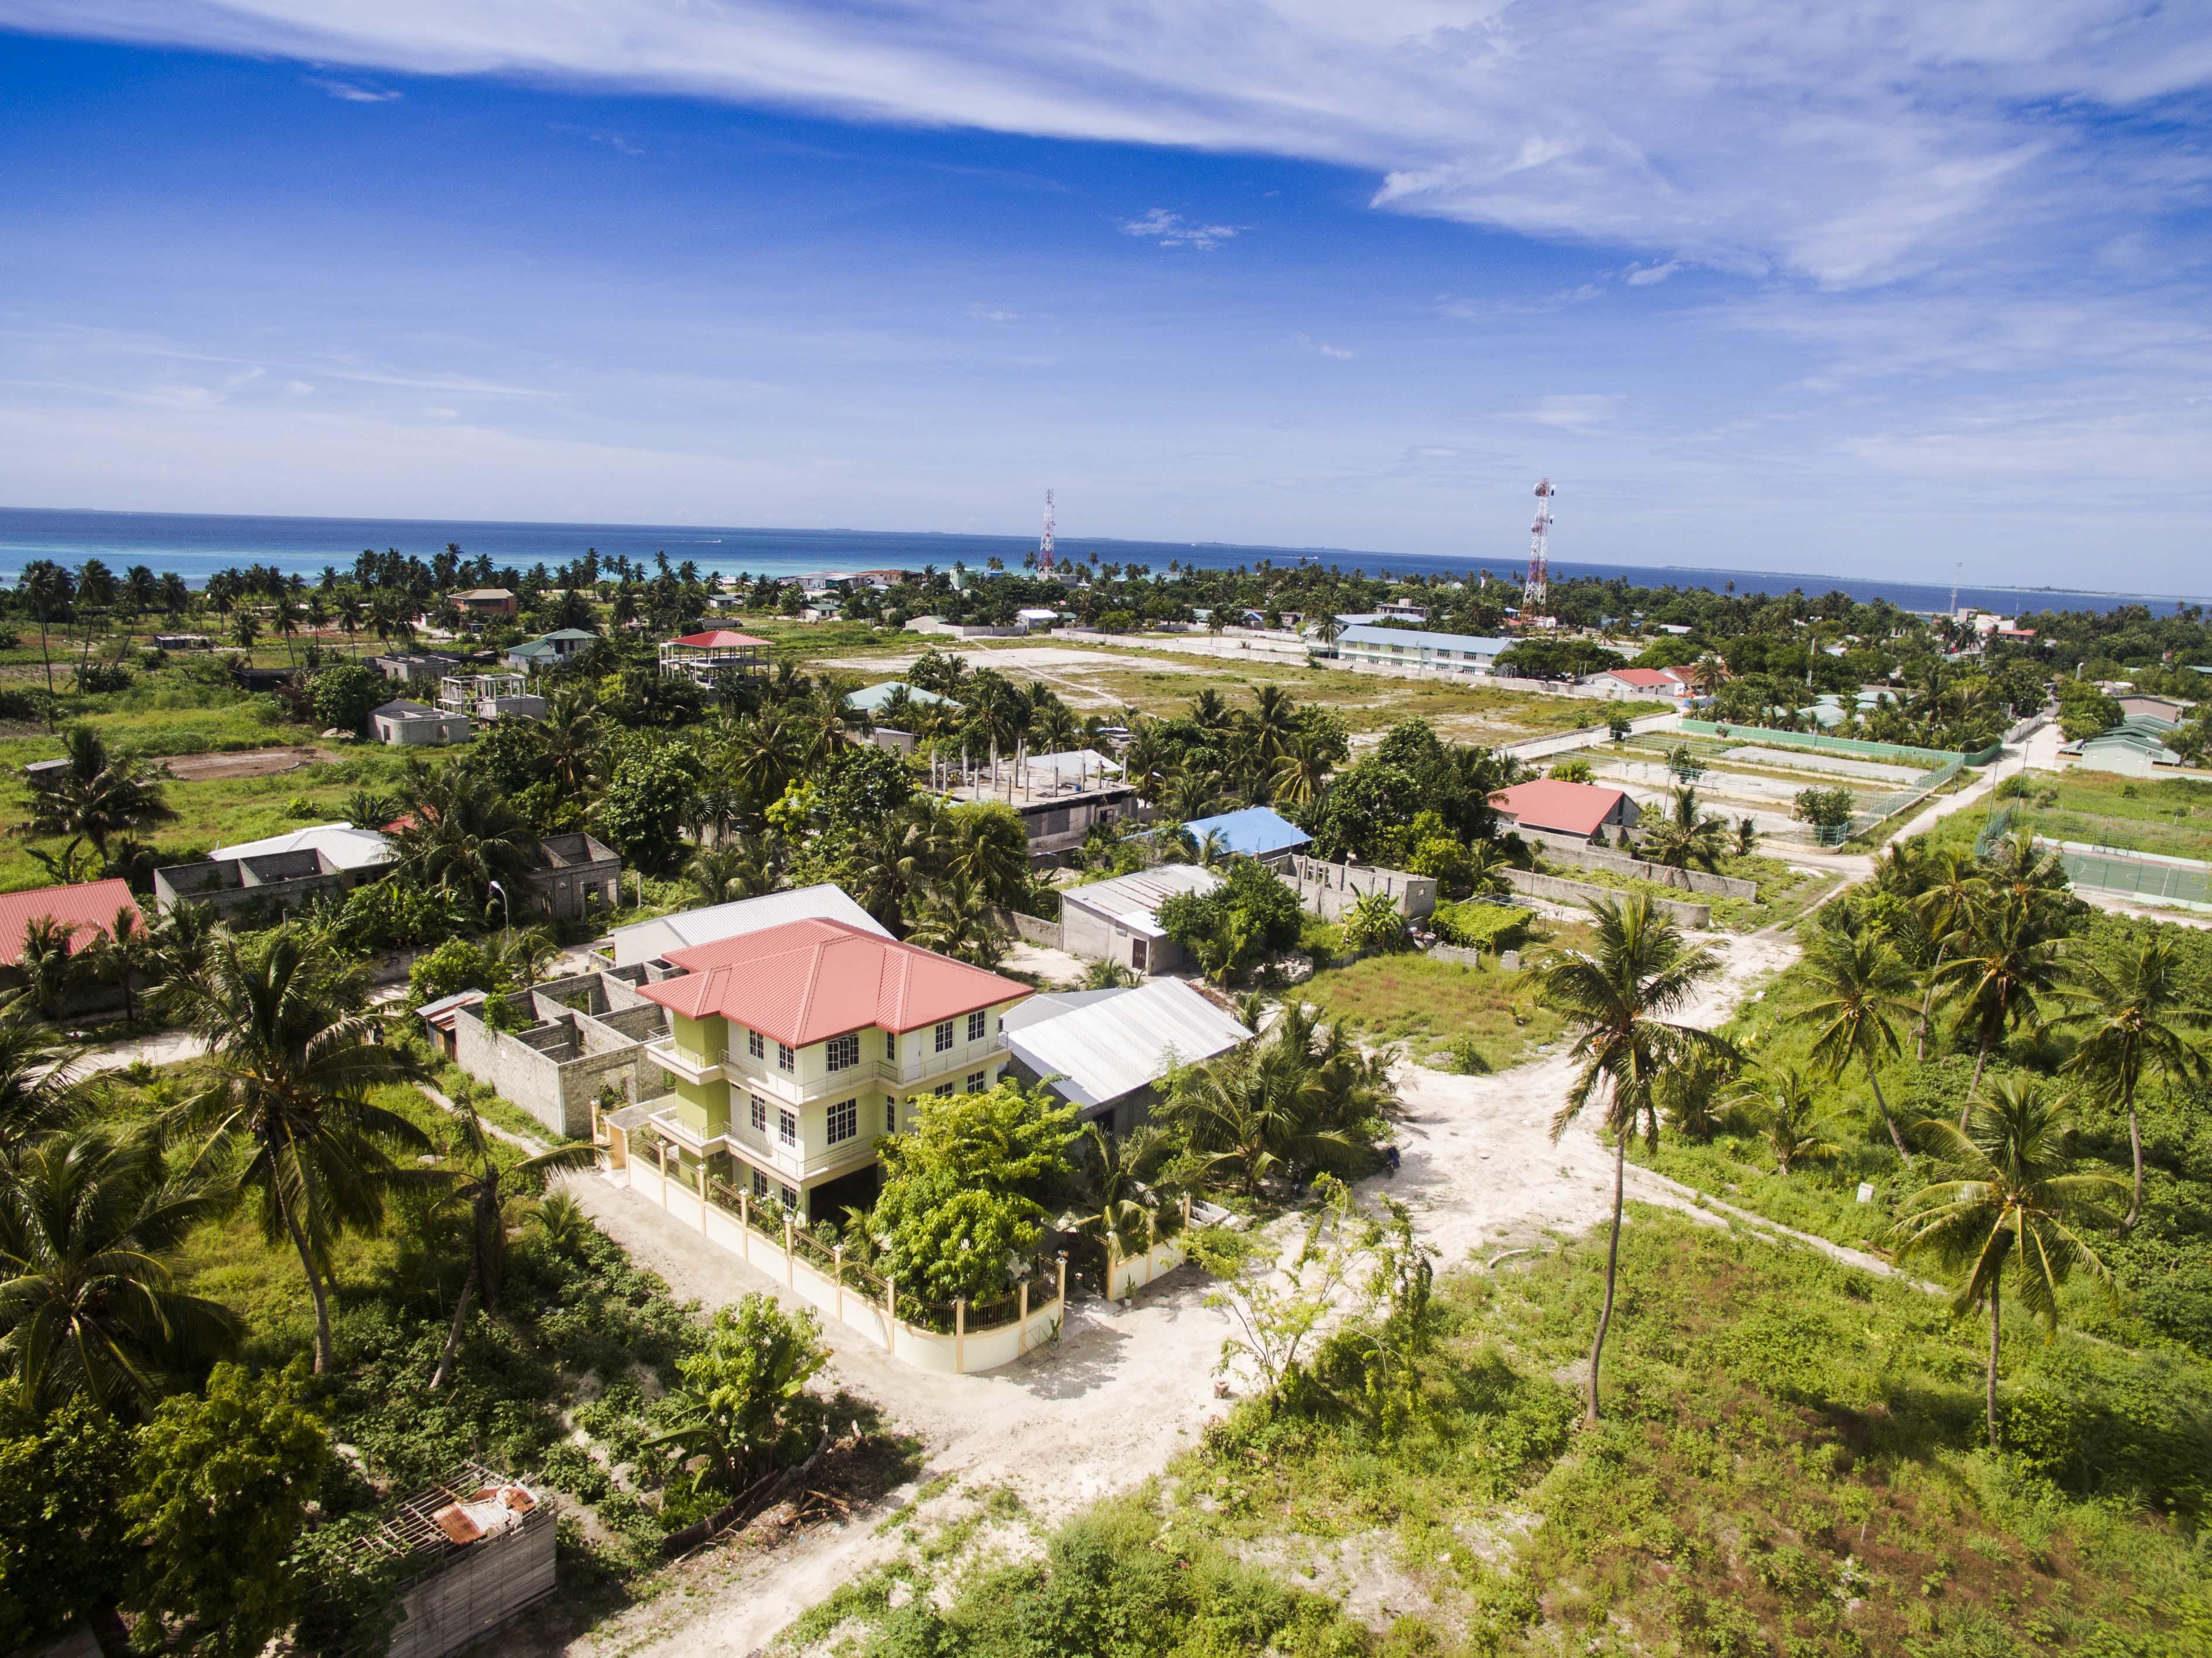 Lacabana Maldives  A Dh Maamigili Island (10)